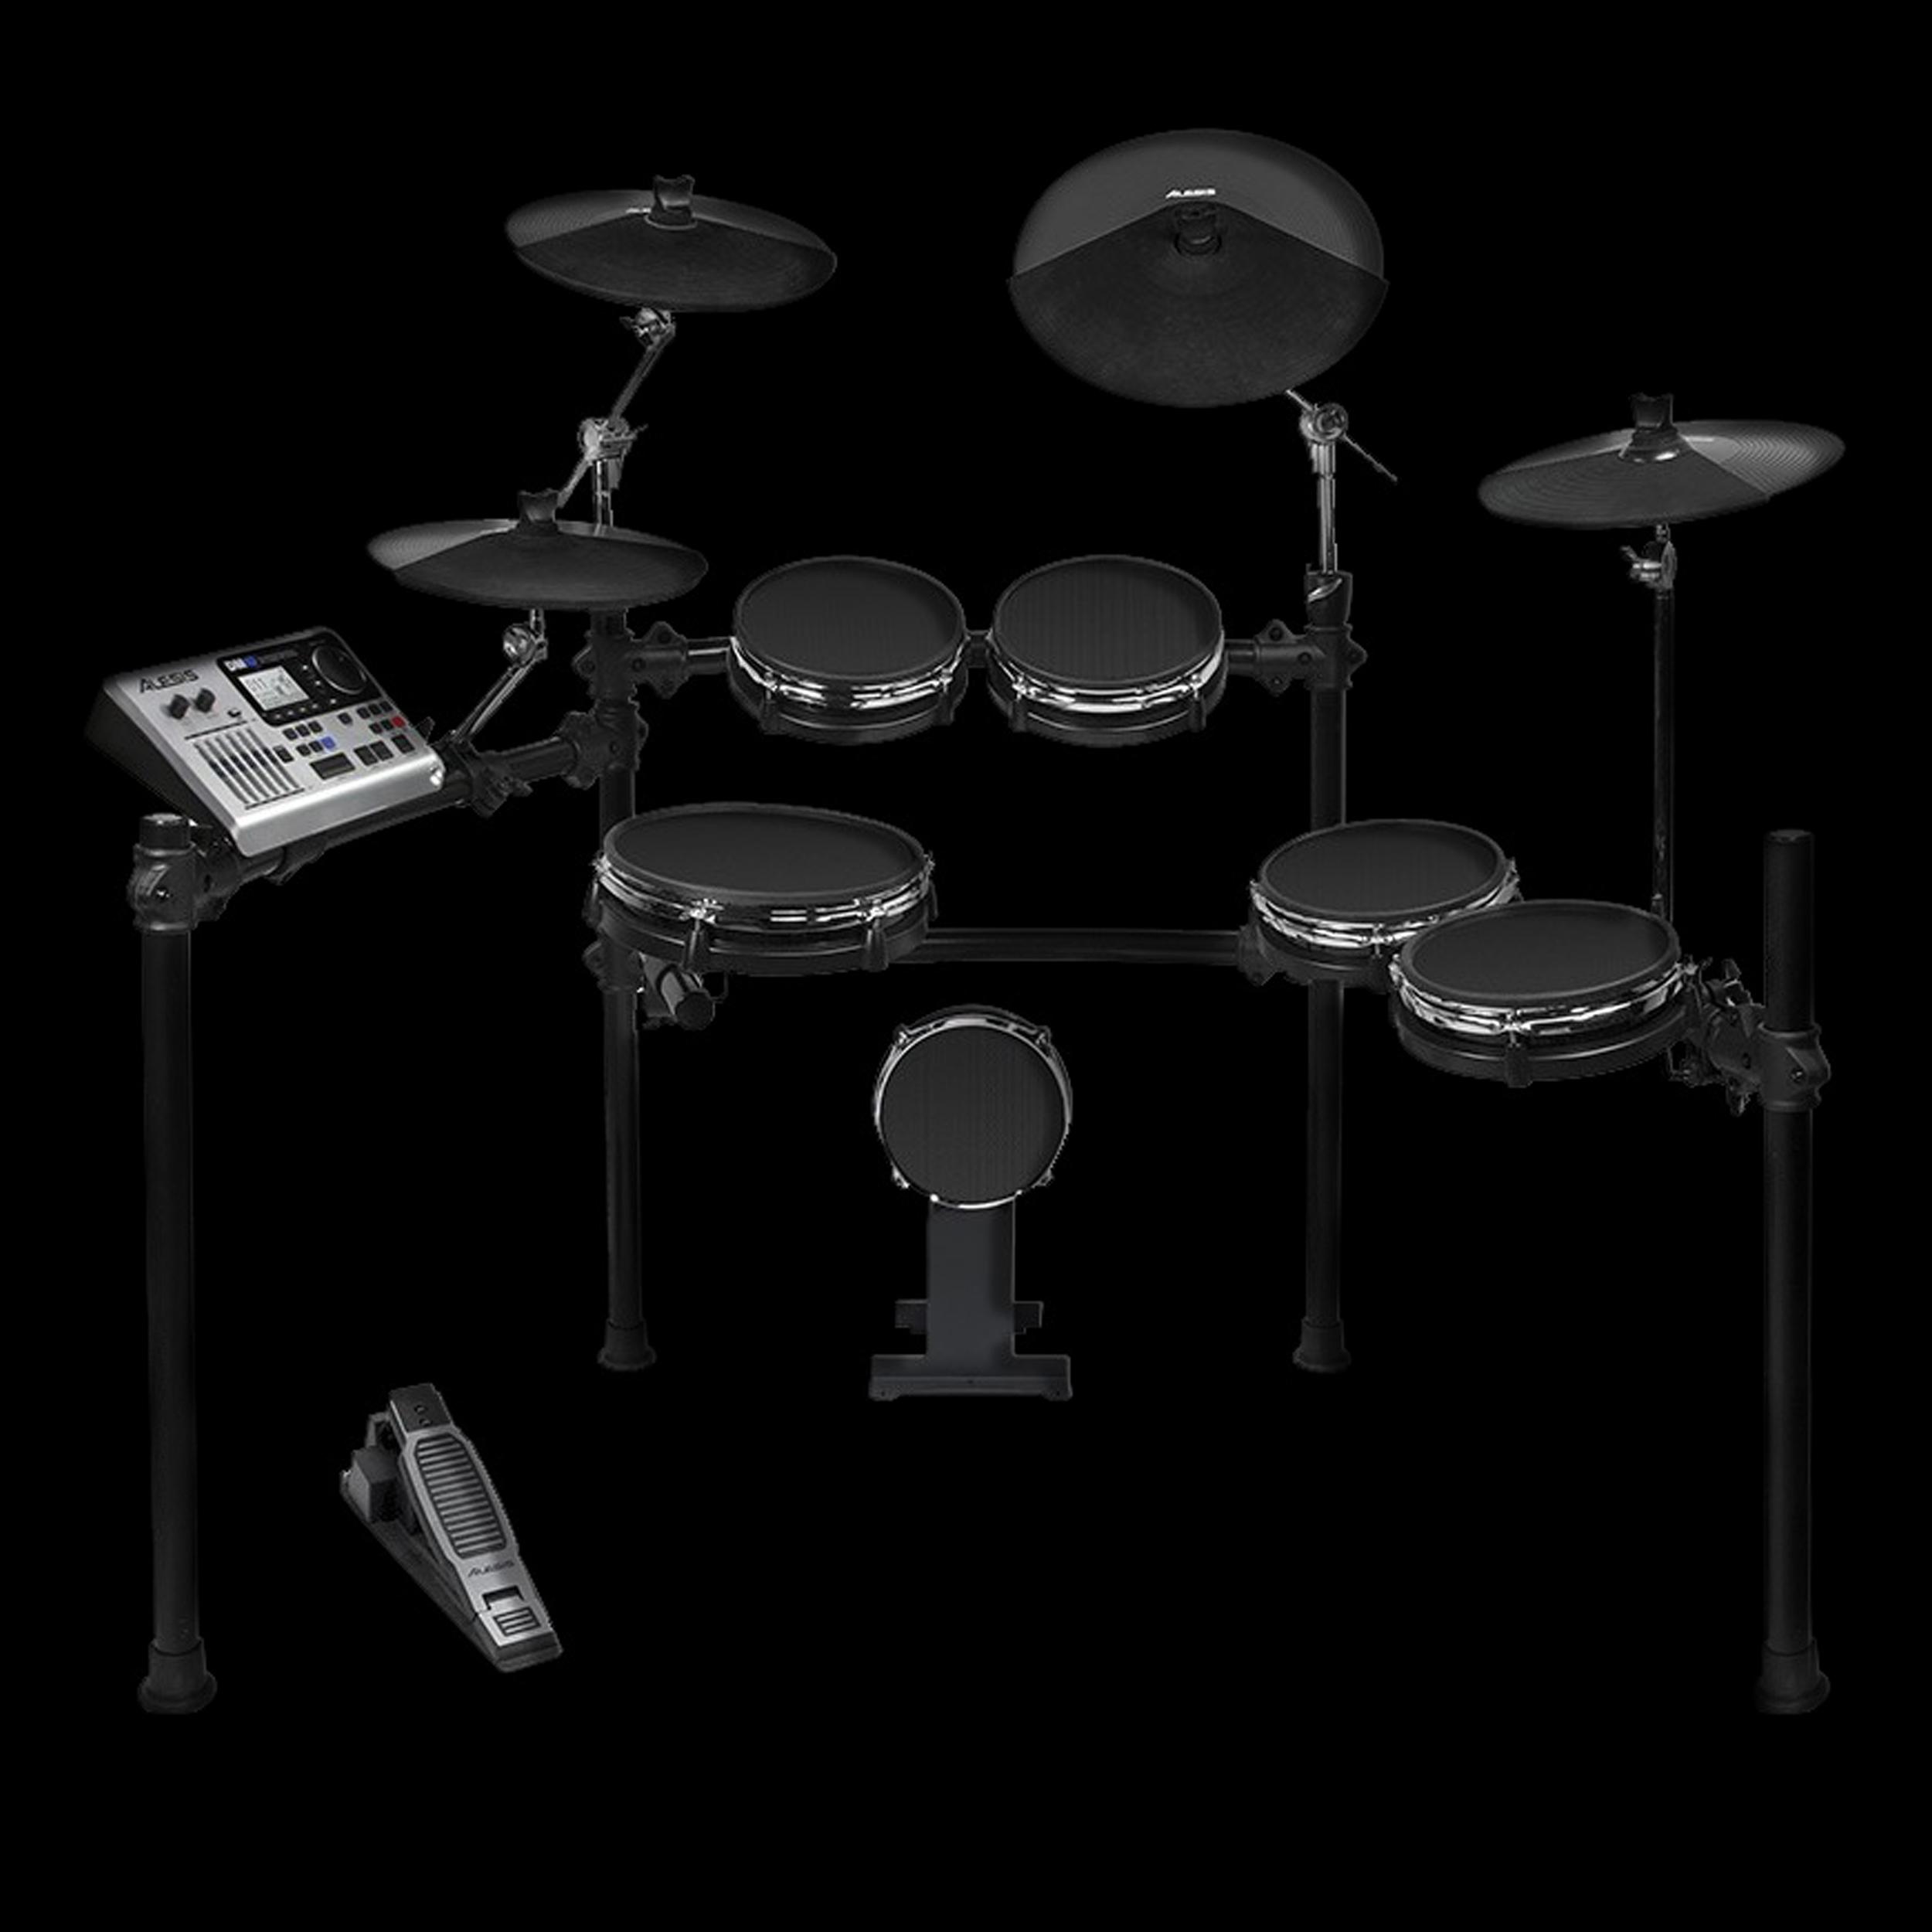 alesis dm10 electronic studio mesh kit w rack ebay. Black Bedroom Furniture Sets. Home Design Ideas